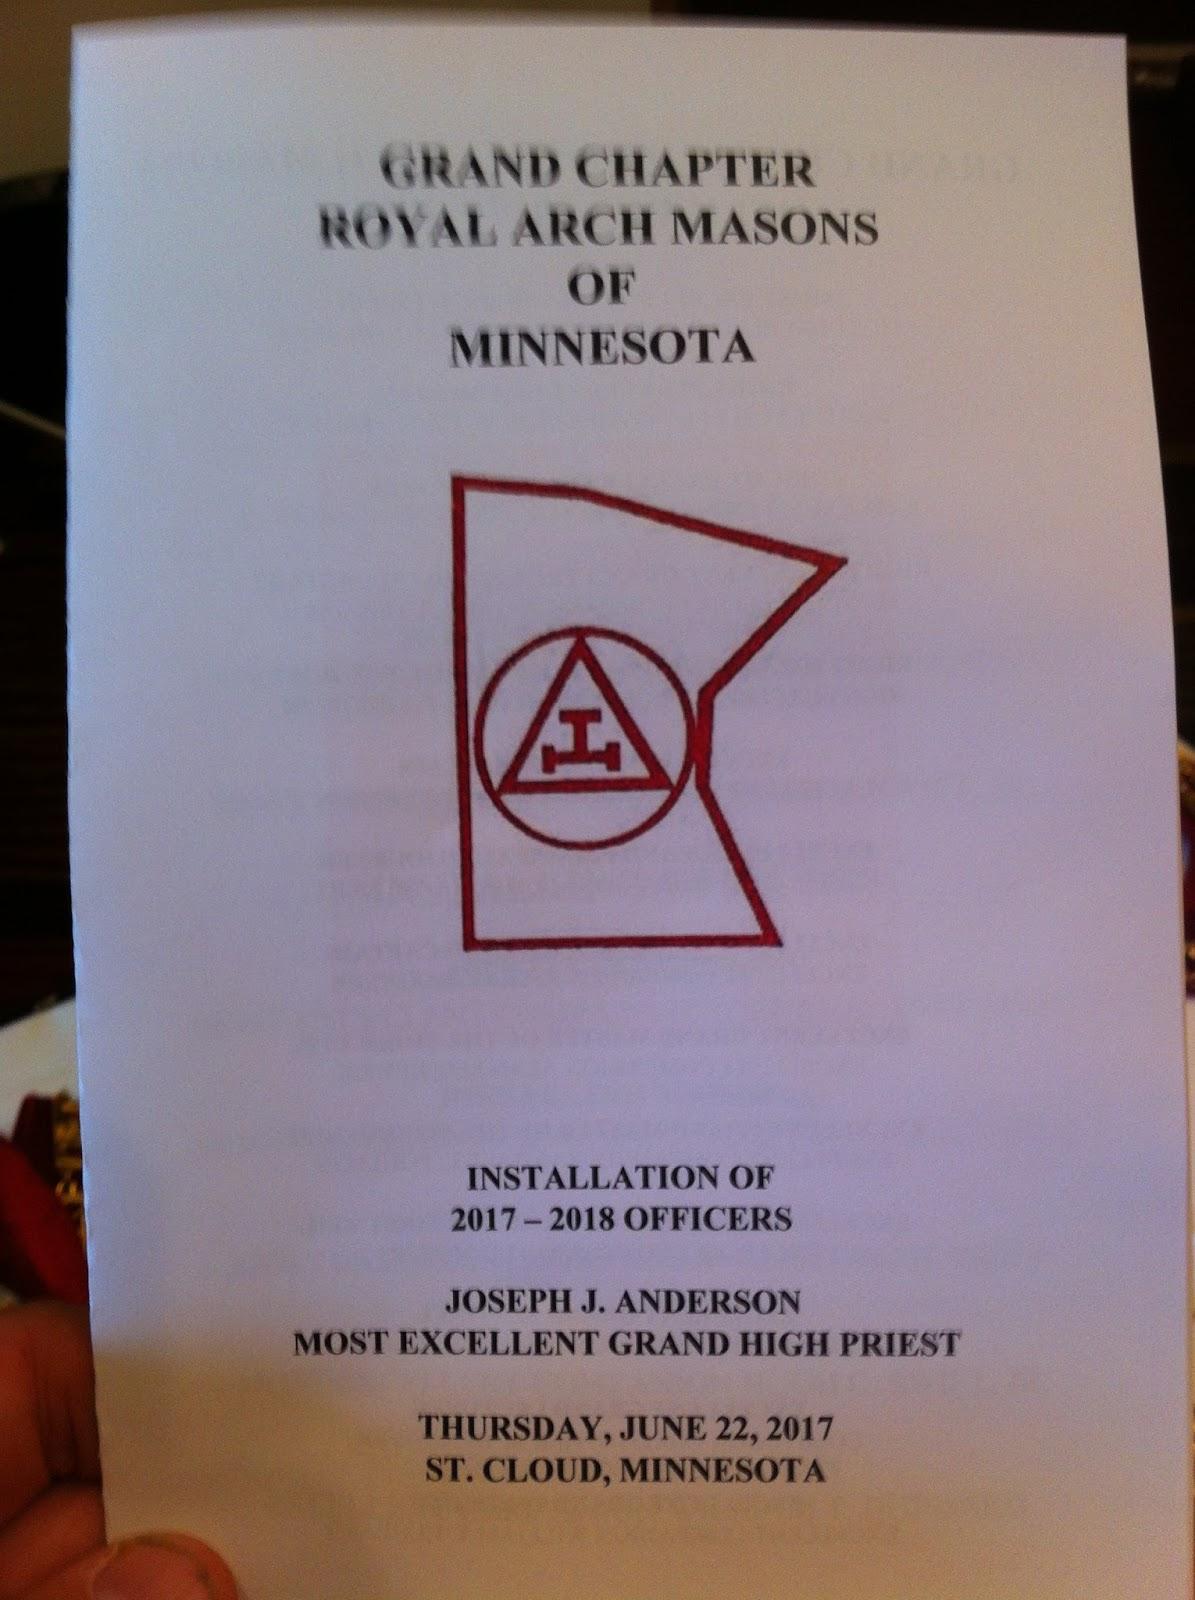 York Rite Manual or ritual